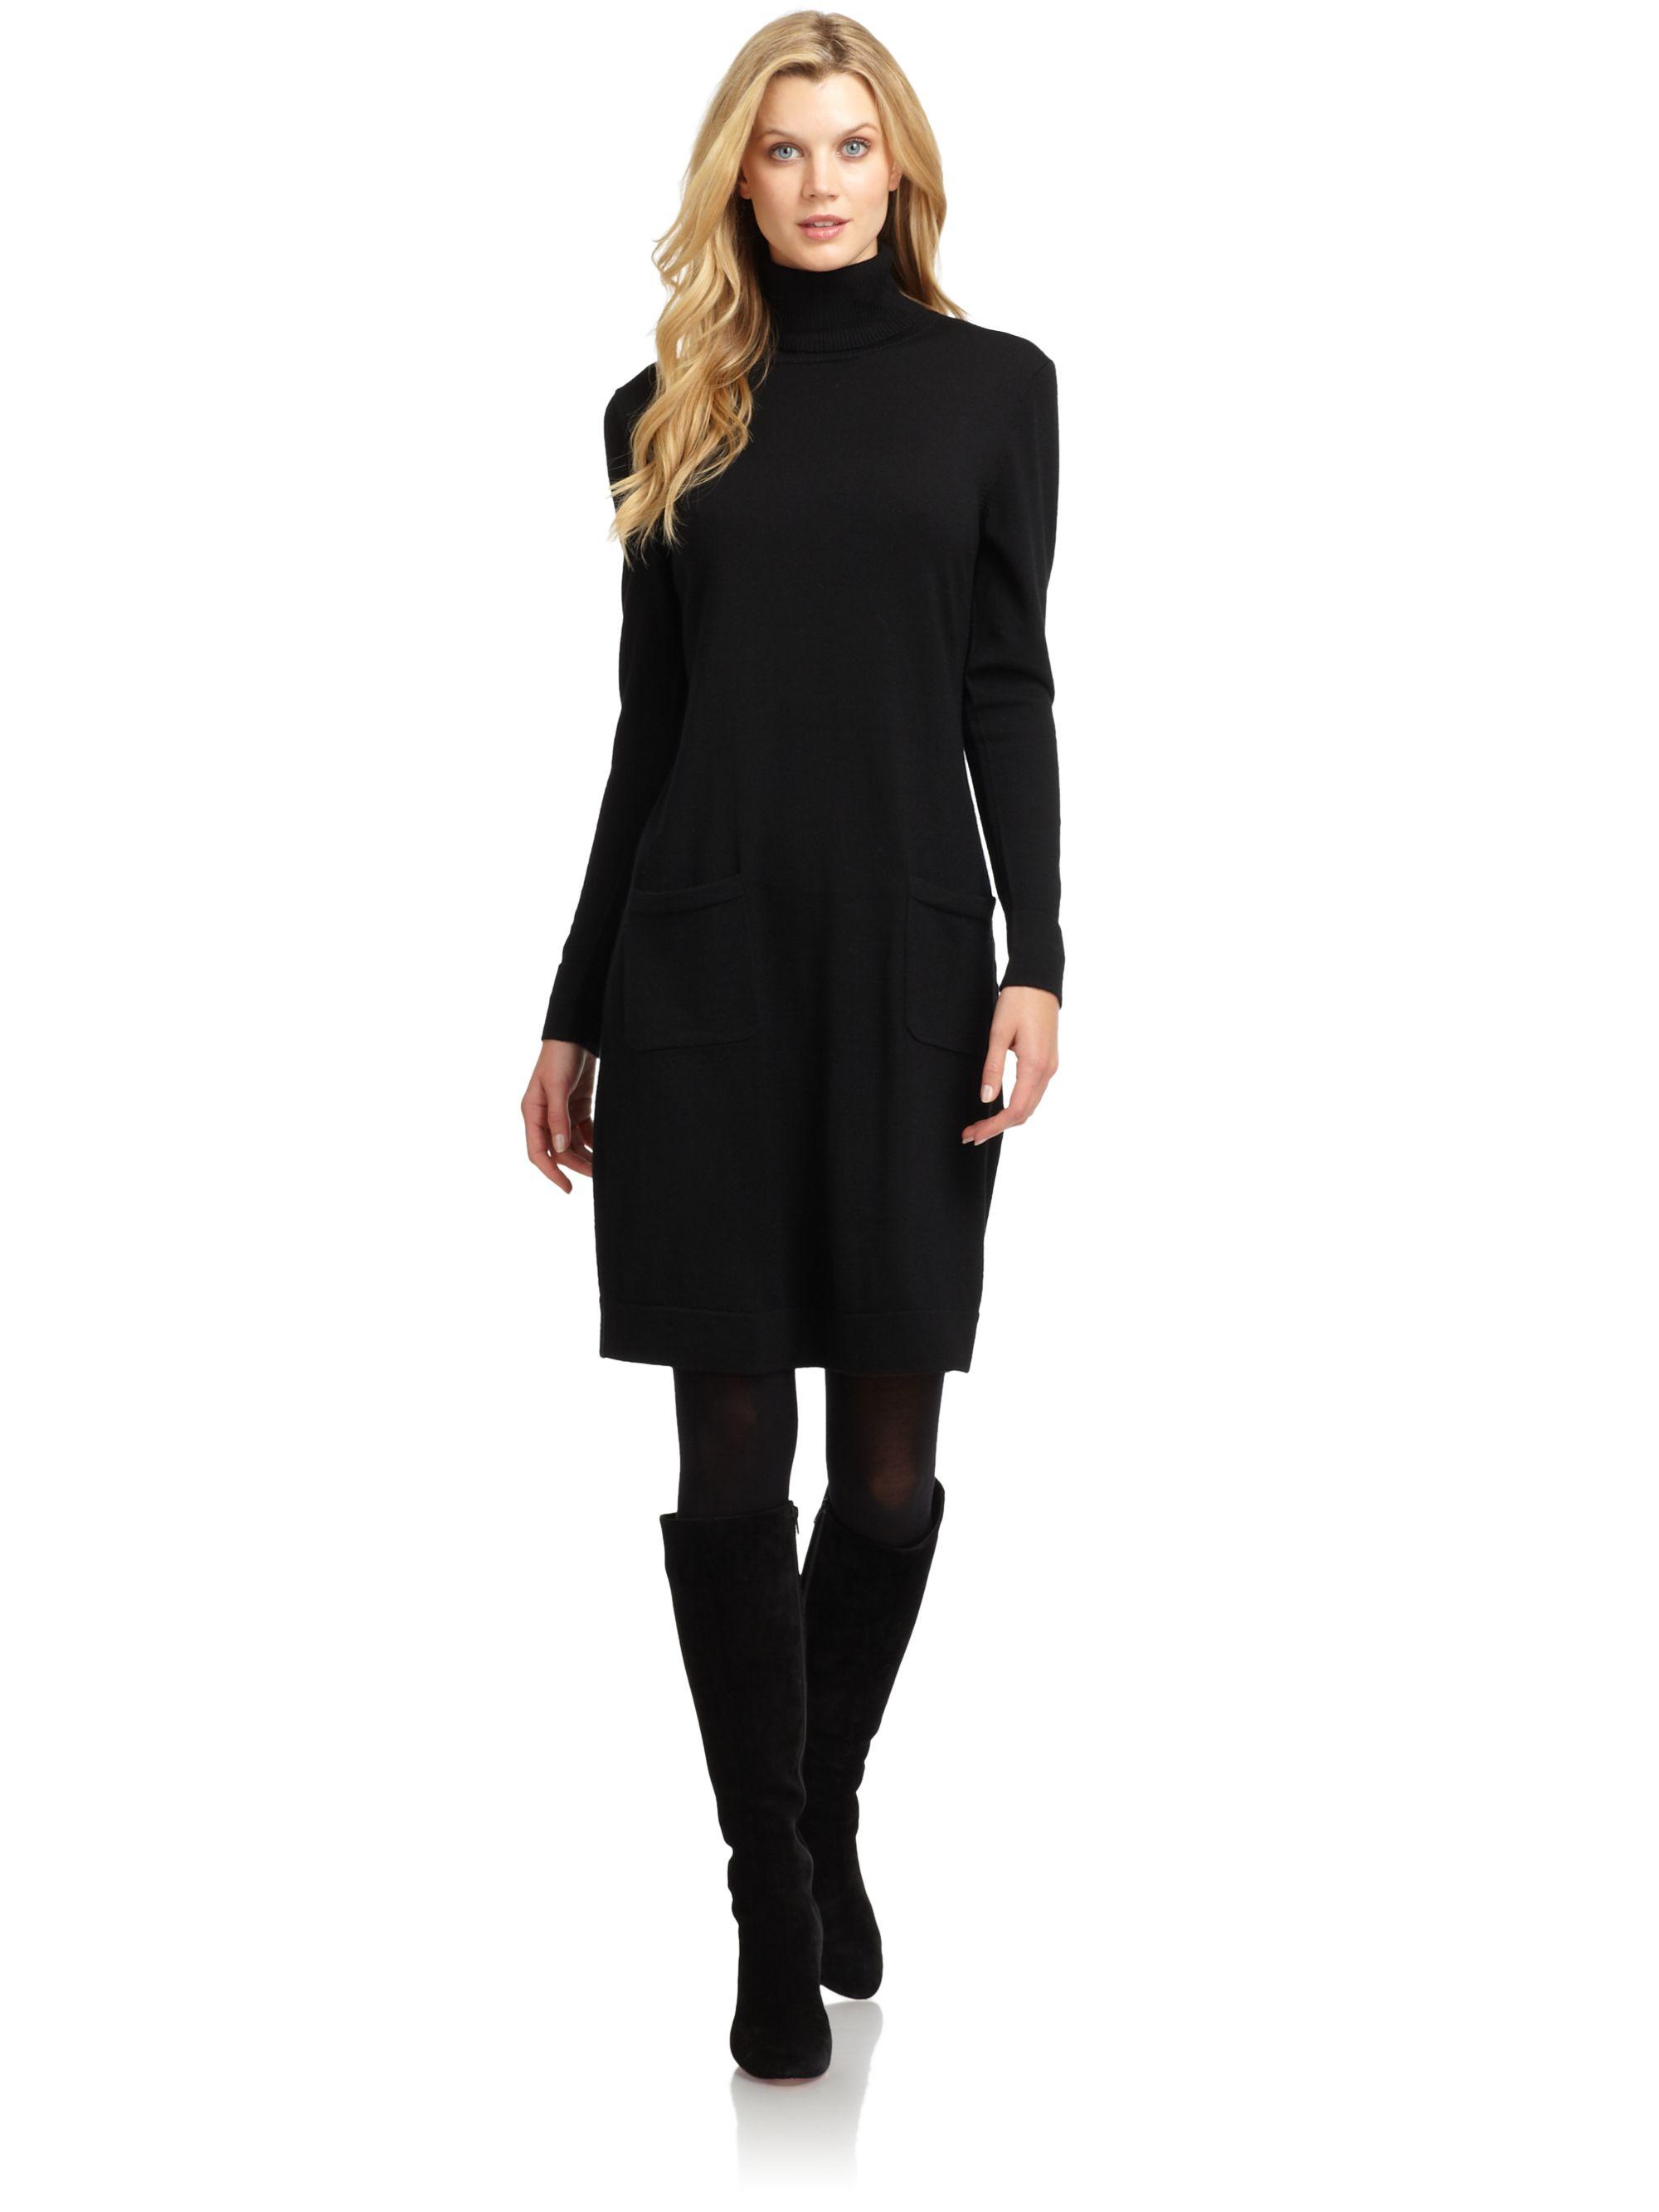 Turtleneck Sweater Dress - DriverLayer Search Engine